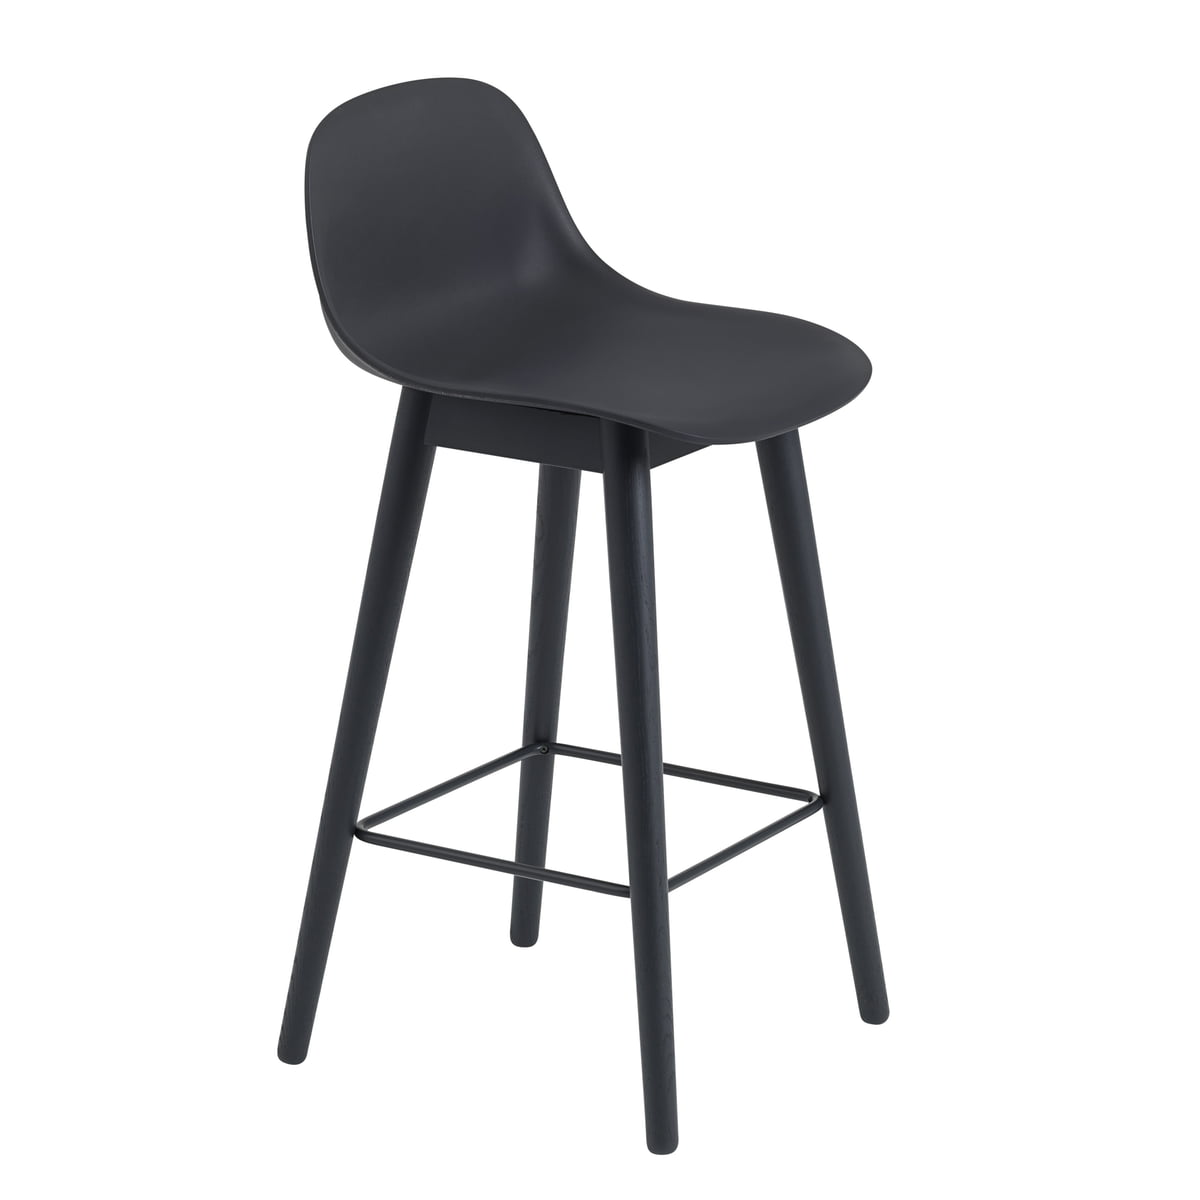 Outstanding Muuto Fiber Bar Stool Wood Base With Backrest H 65 Cm Oak Cognac Leather Beatyapartments Chair Design Images Beatyapartmentscom